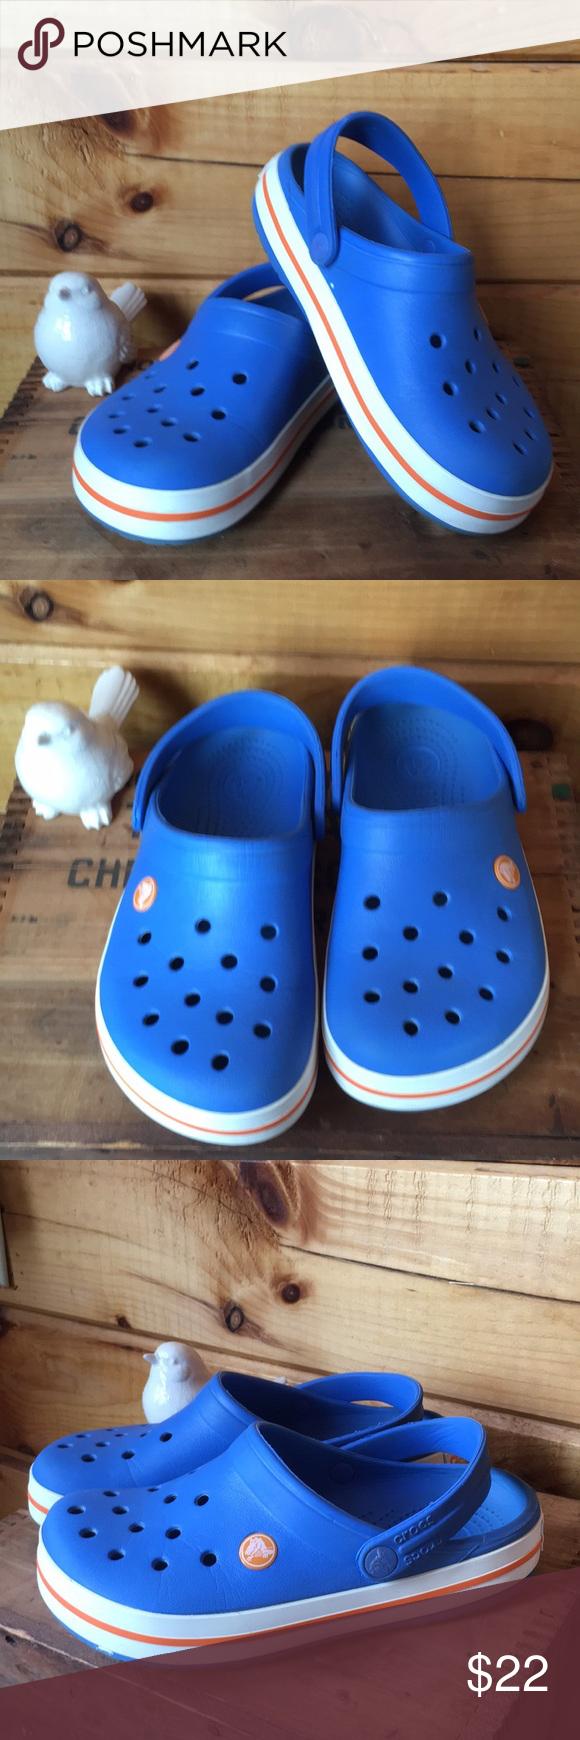 da3326fb9 Crocs clog Crocband clog in blue and white with orange stripe. Unisex